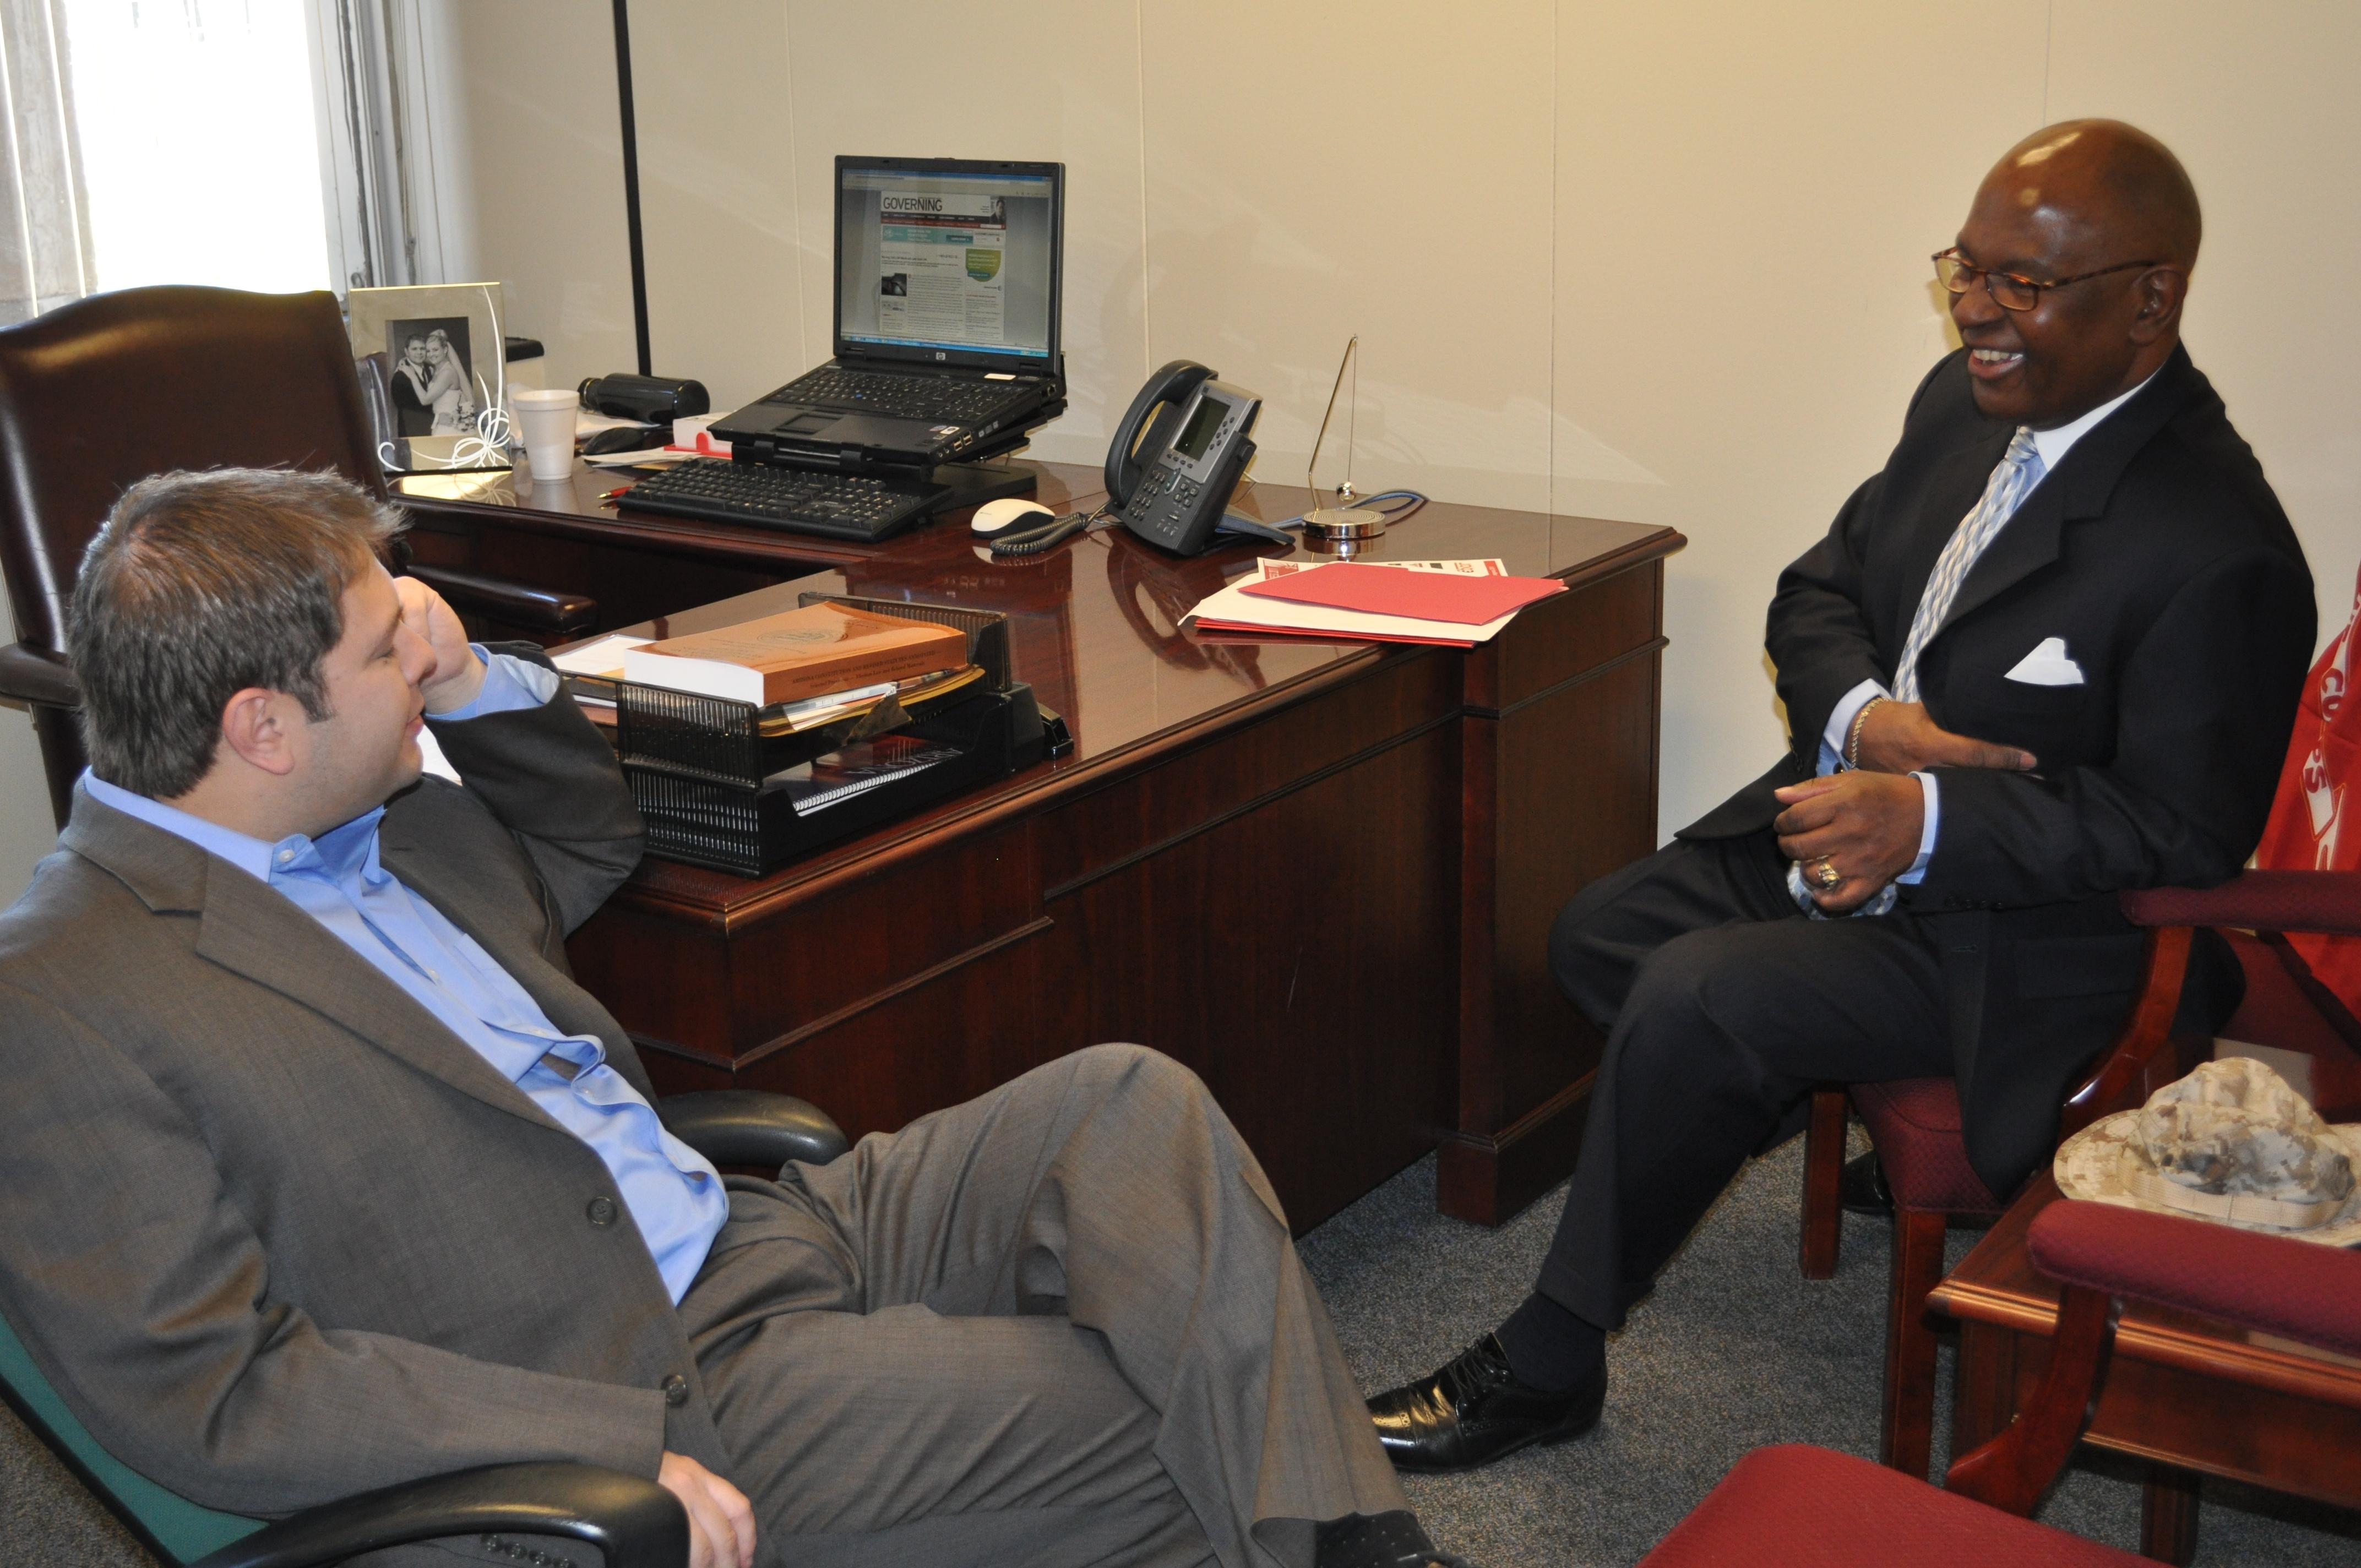 Arizona Representative Ruben Gallego meeting with David Hemphill, BTT managing, during the 2011 Arts Congress.